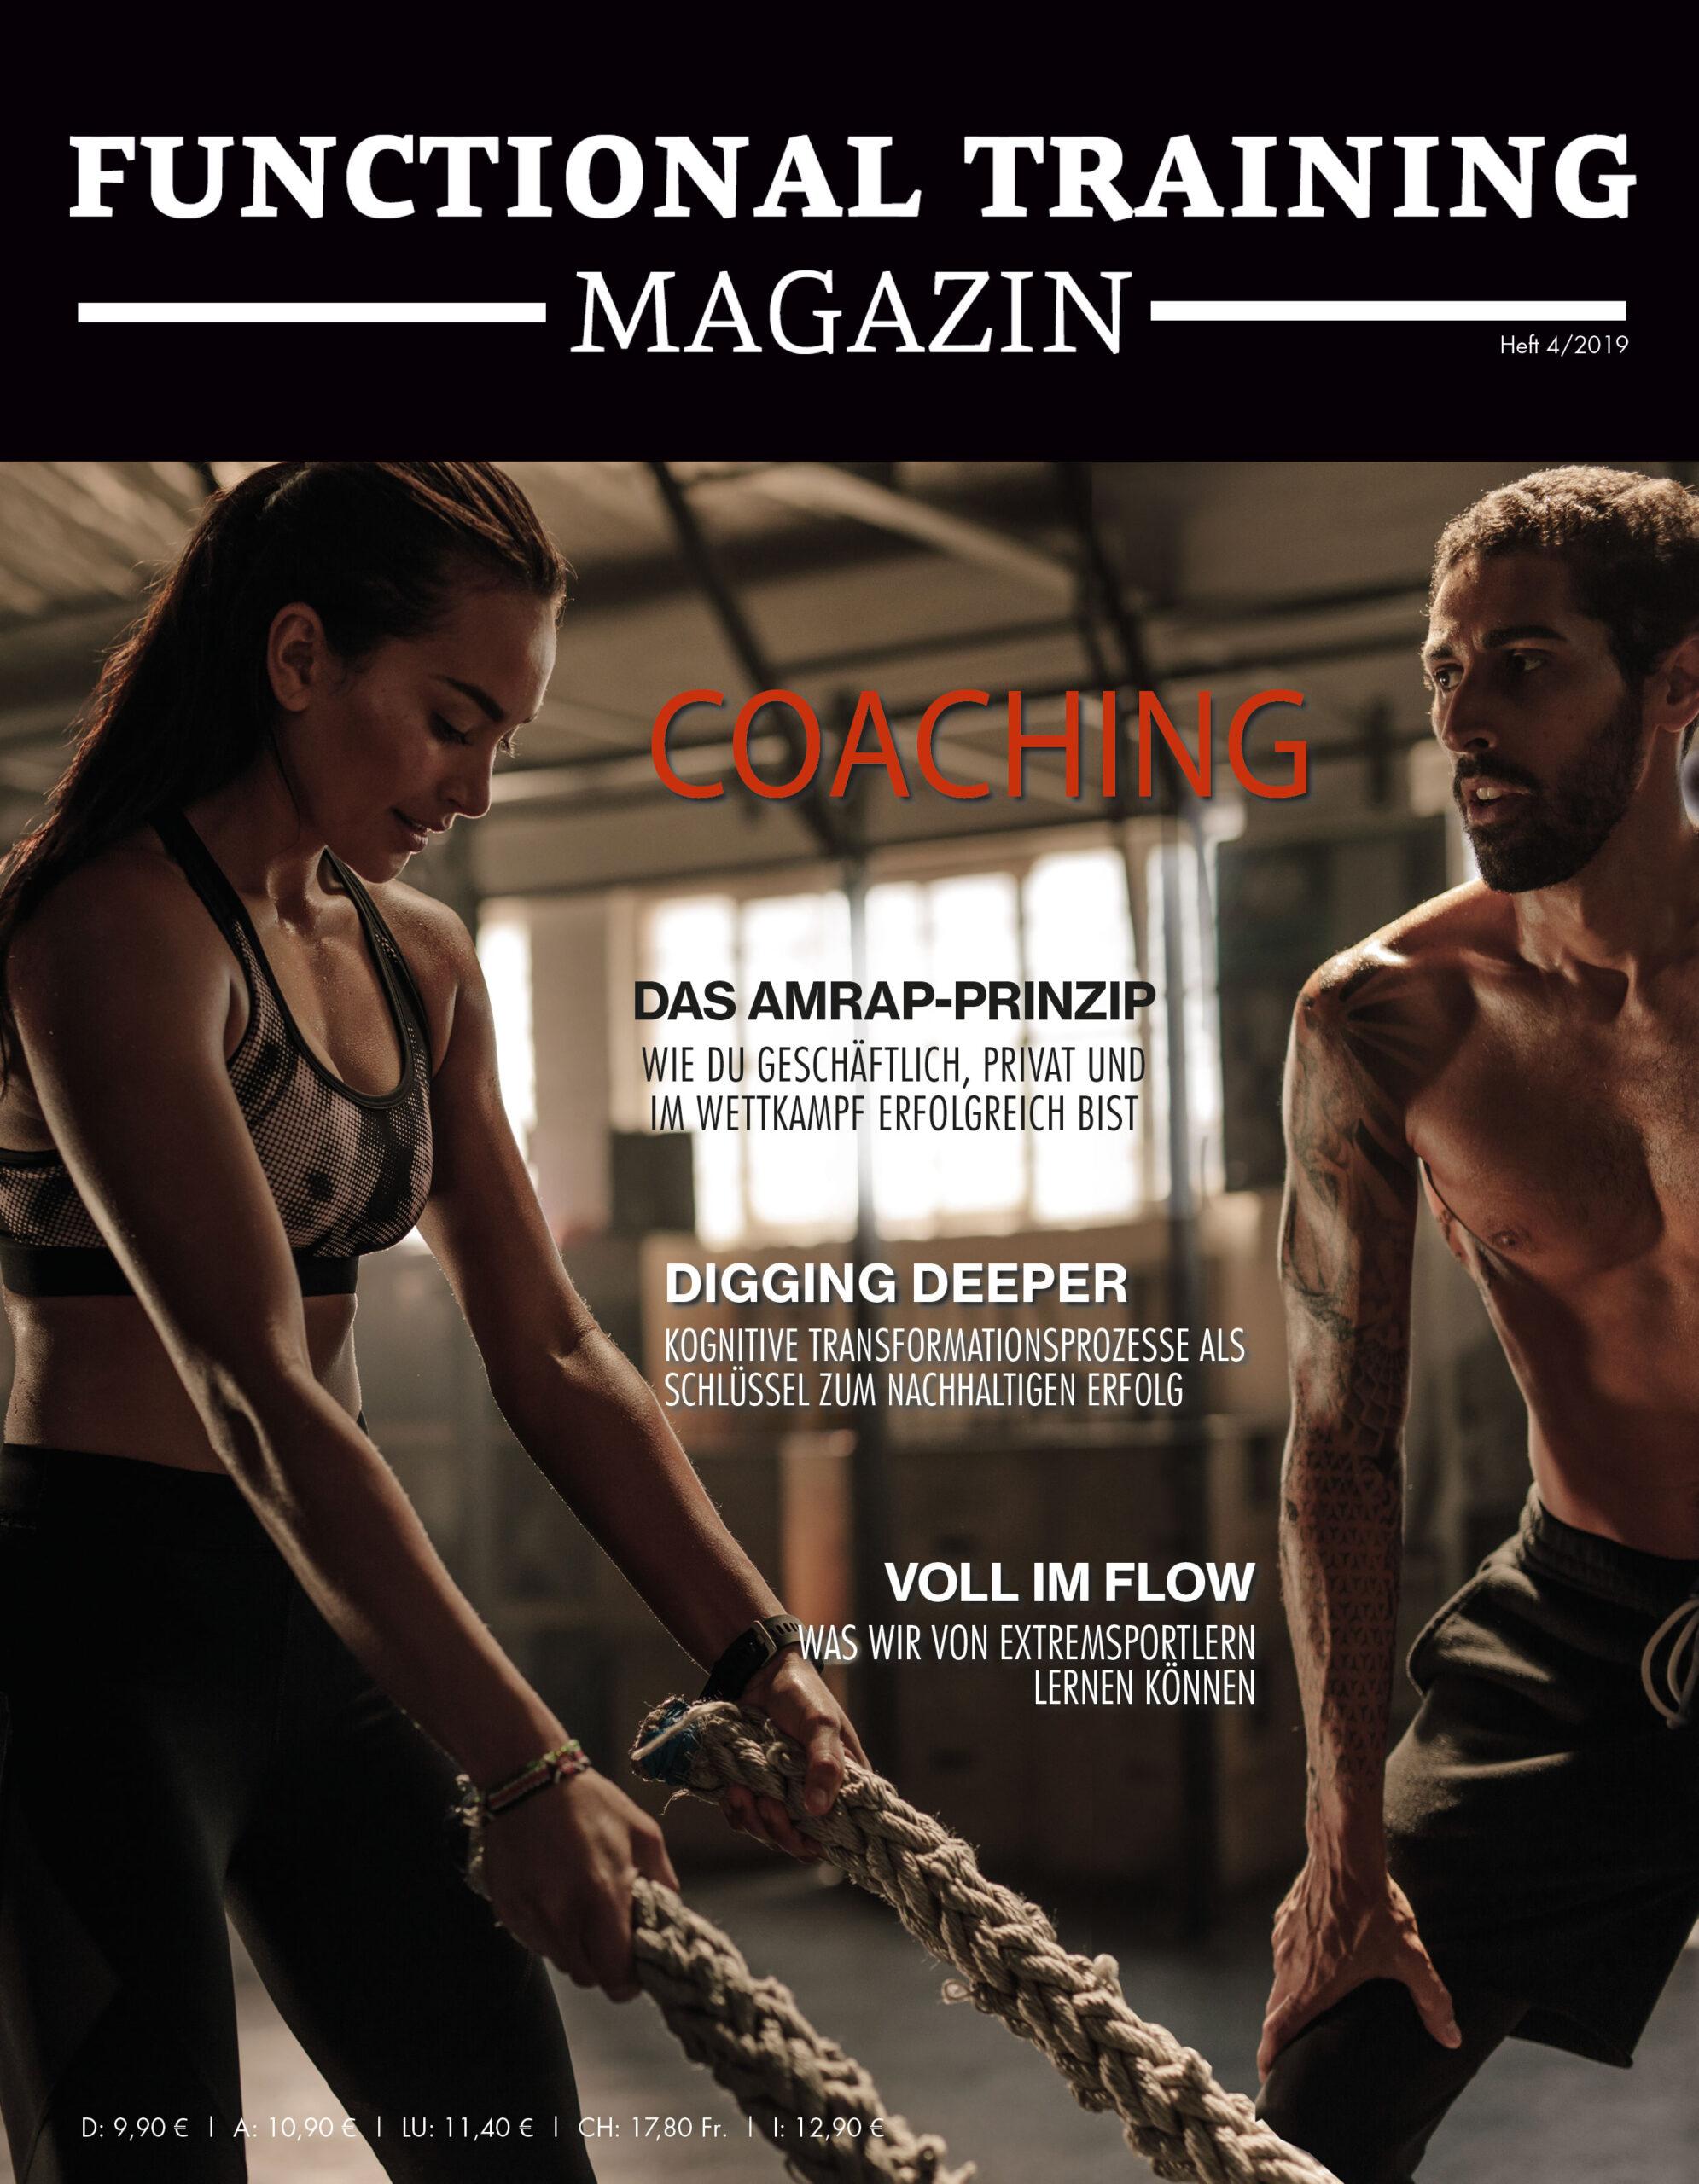 ftm-4-2019-cover-coaching-functional-training-magazin